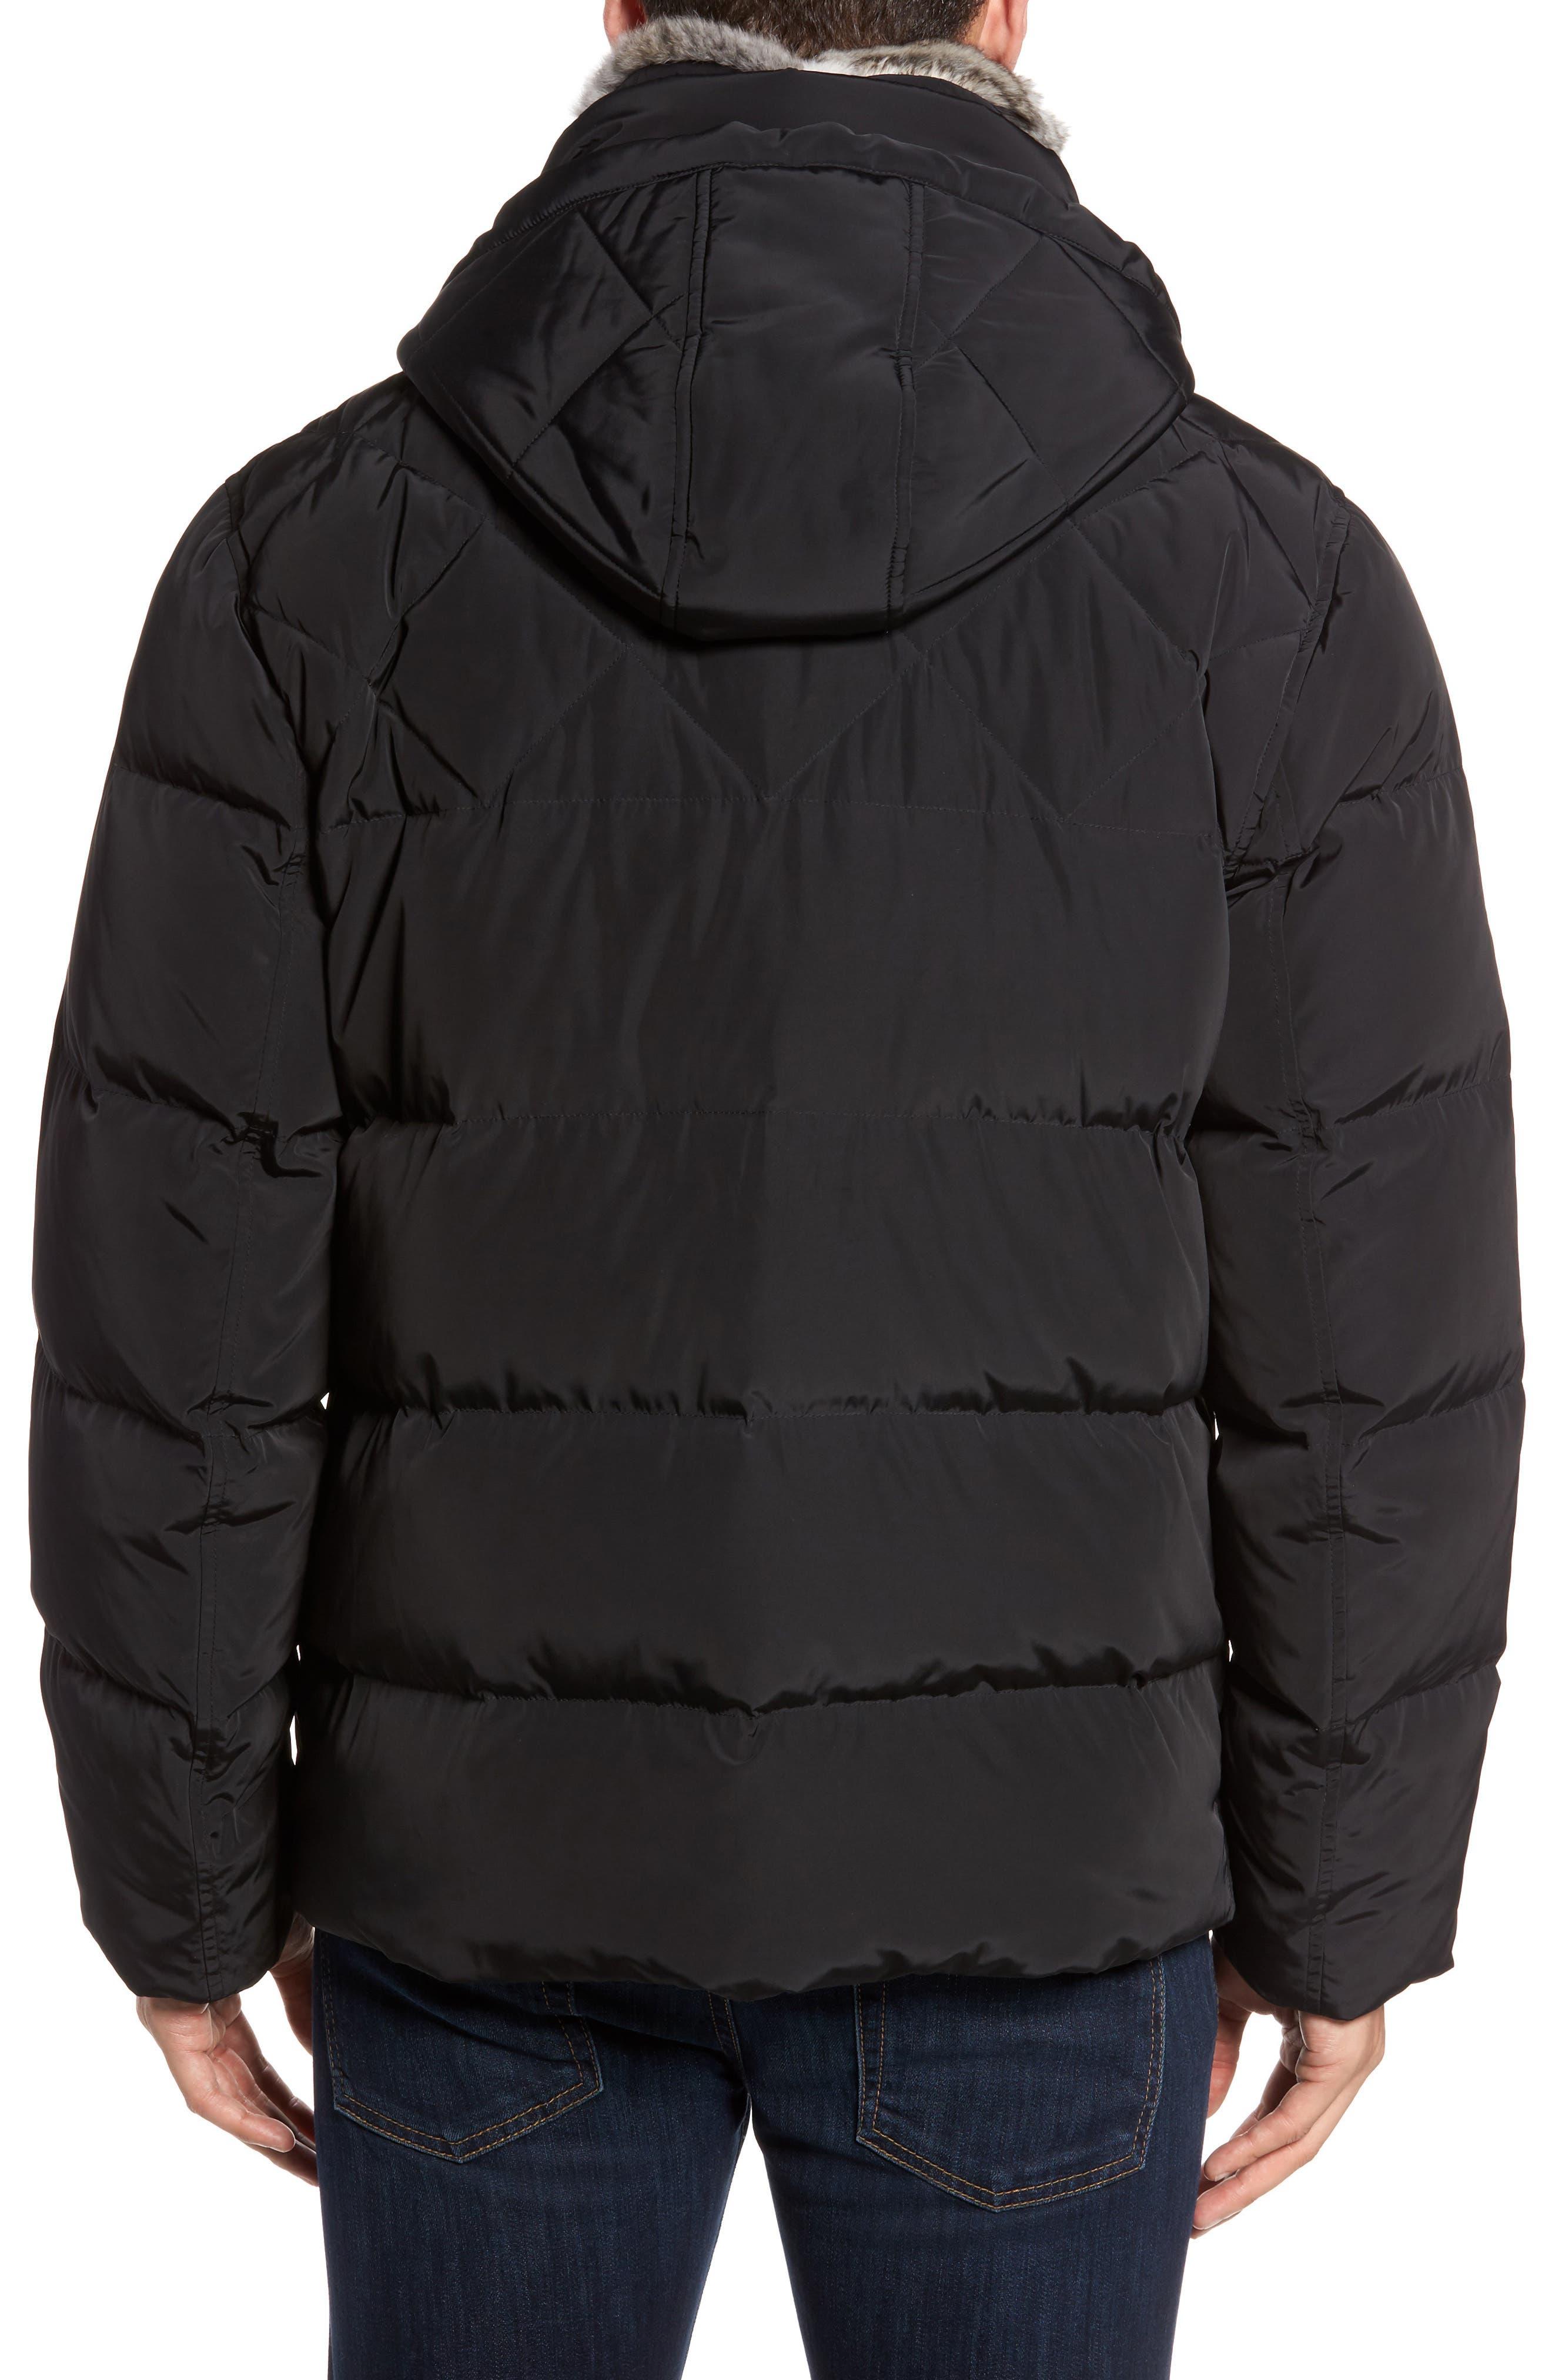 Navan Quilted Down Jacket with Genuine Rabbit Fur Trim,                             Alternate thumbnail 2, color,                             001